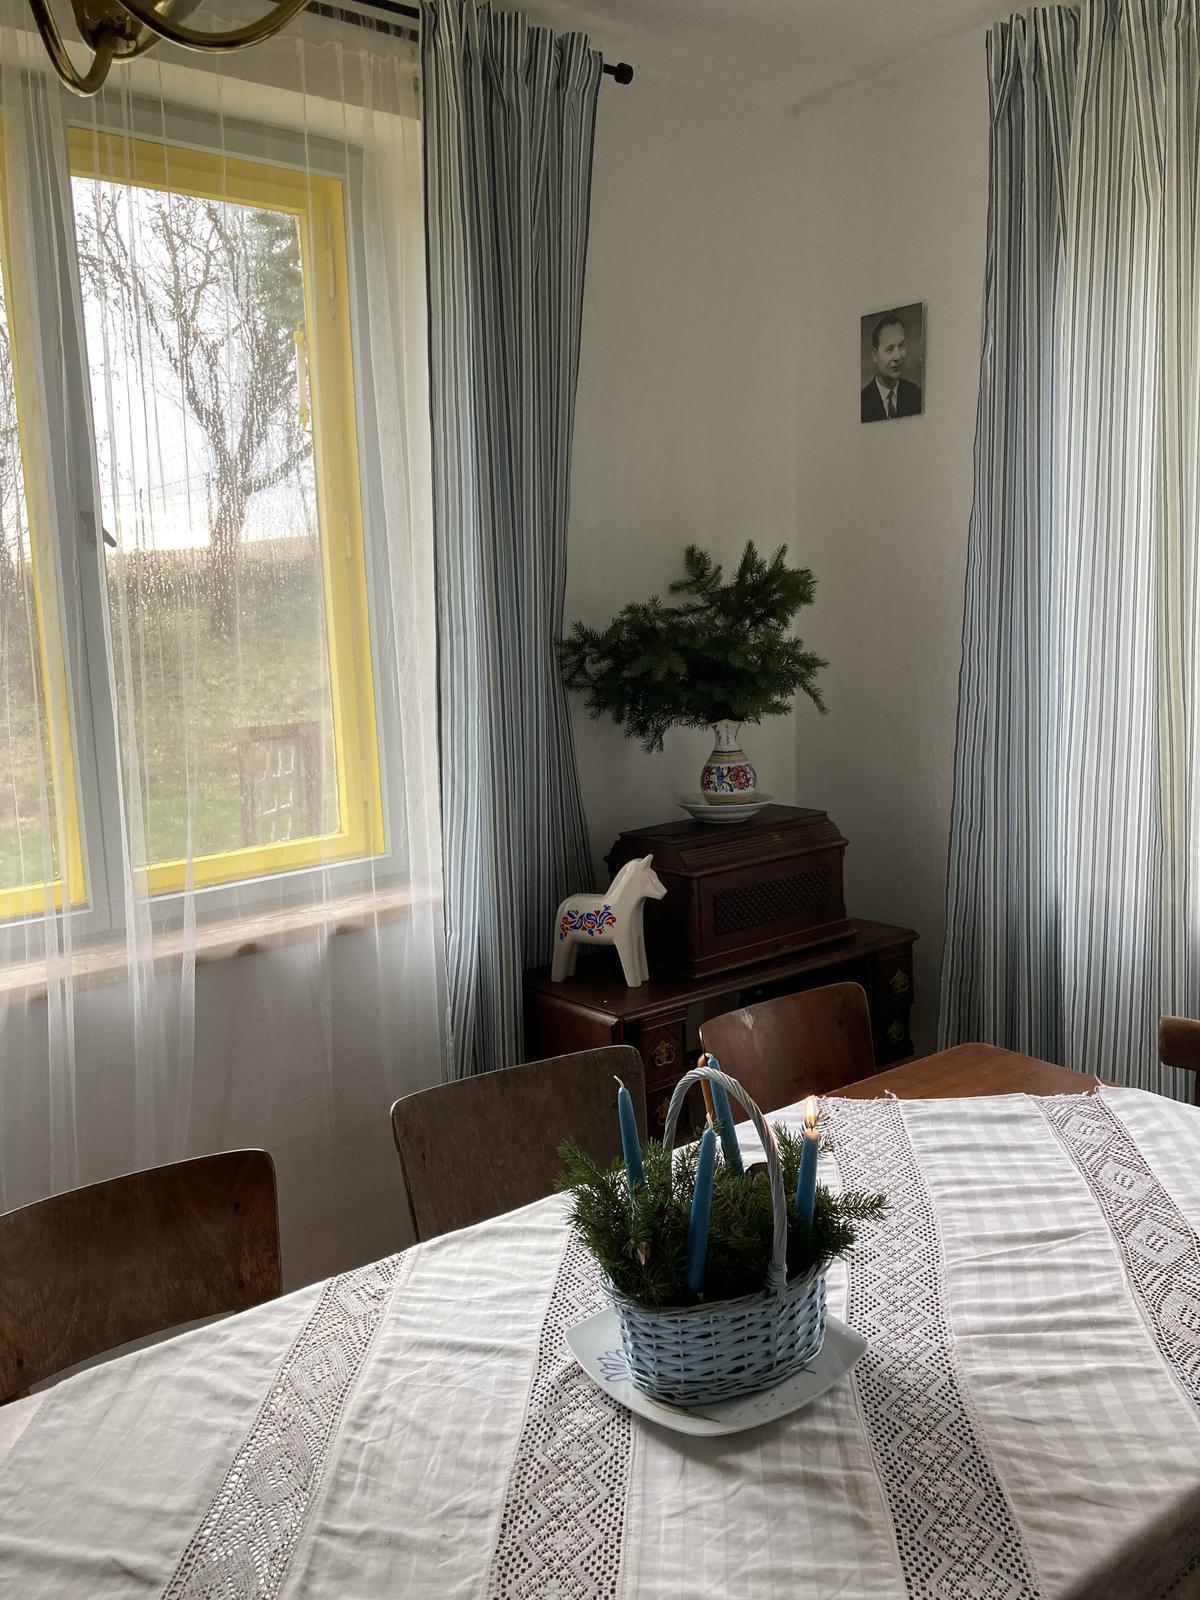 Dom - Obrázok č. 126